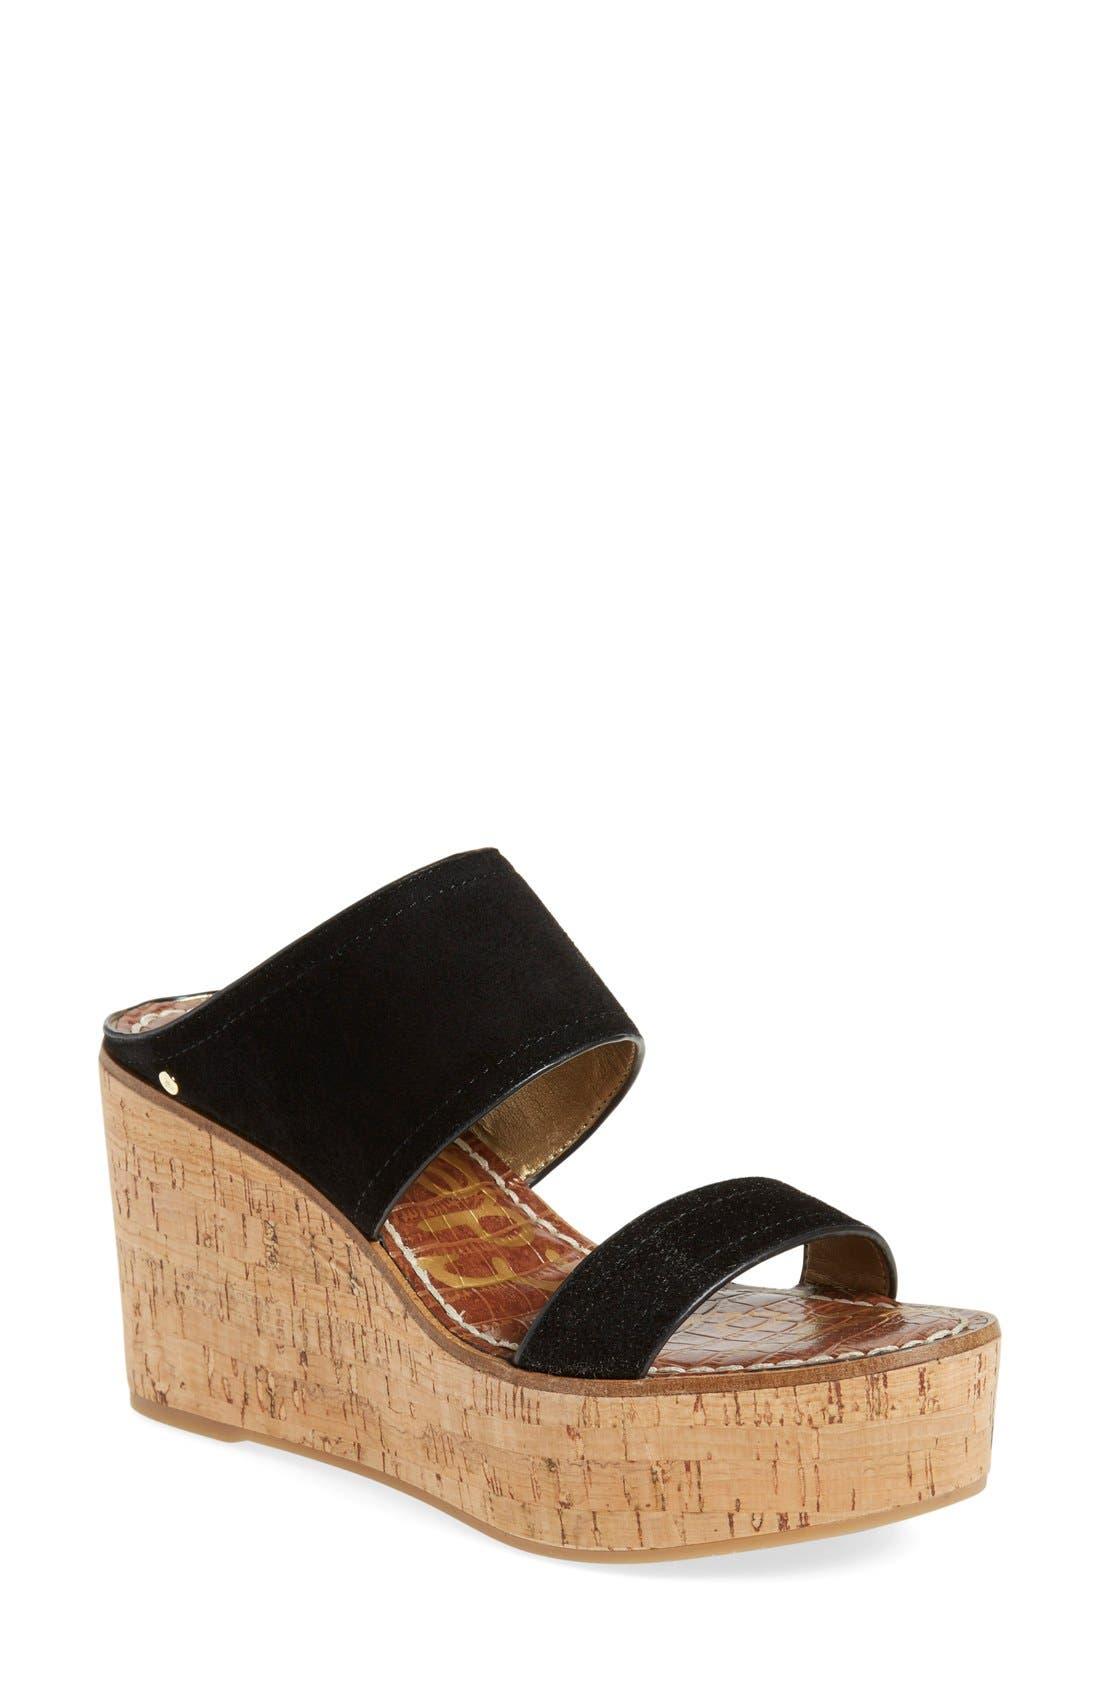 'Dali' Wedge Sandal,                         Main,                         color, Black Suede